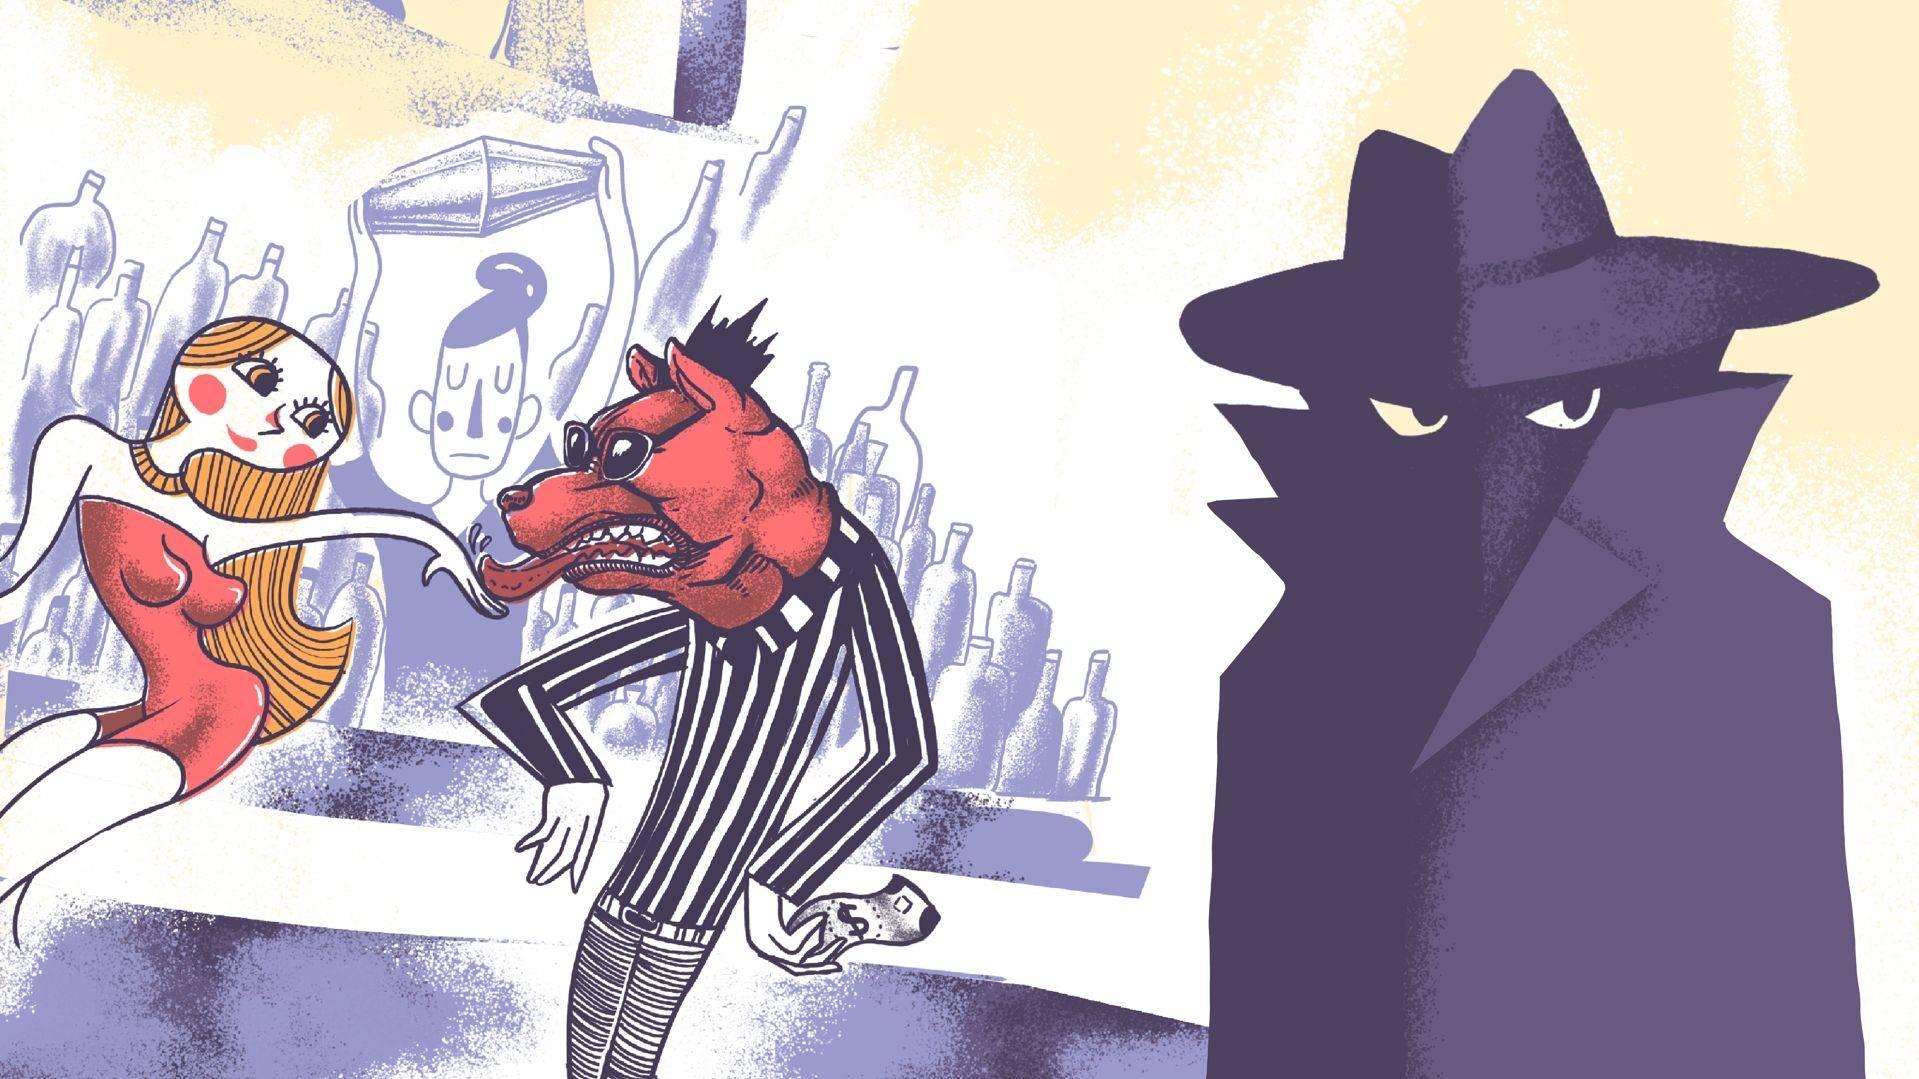 Ilustración: Mayo Bous / Magazine AM:PM.